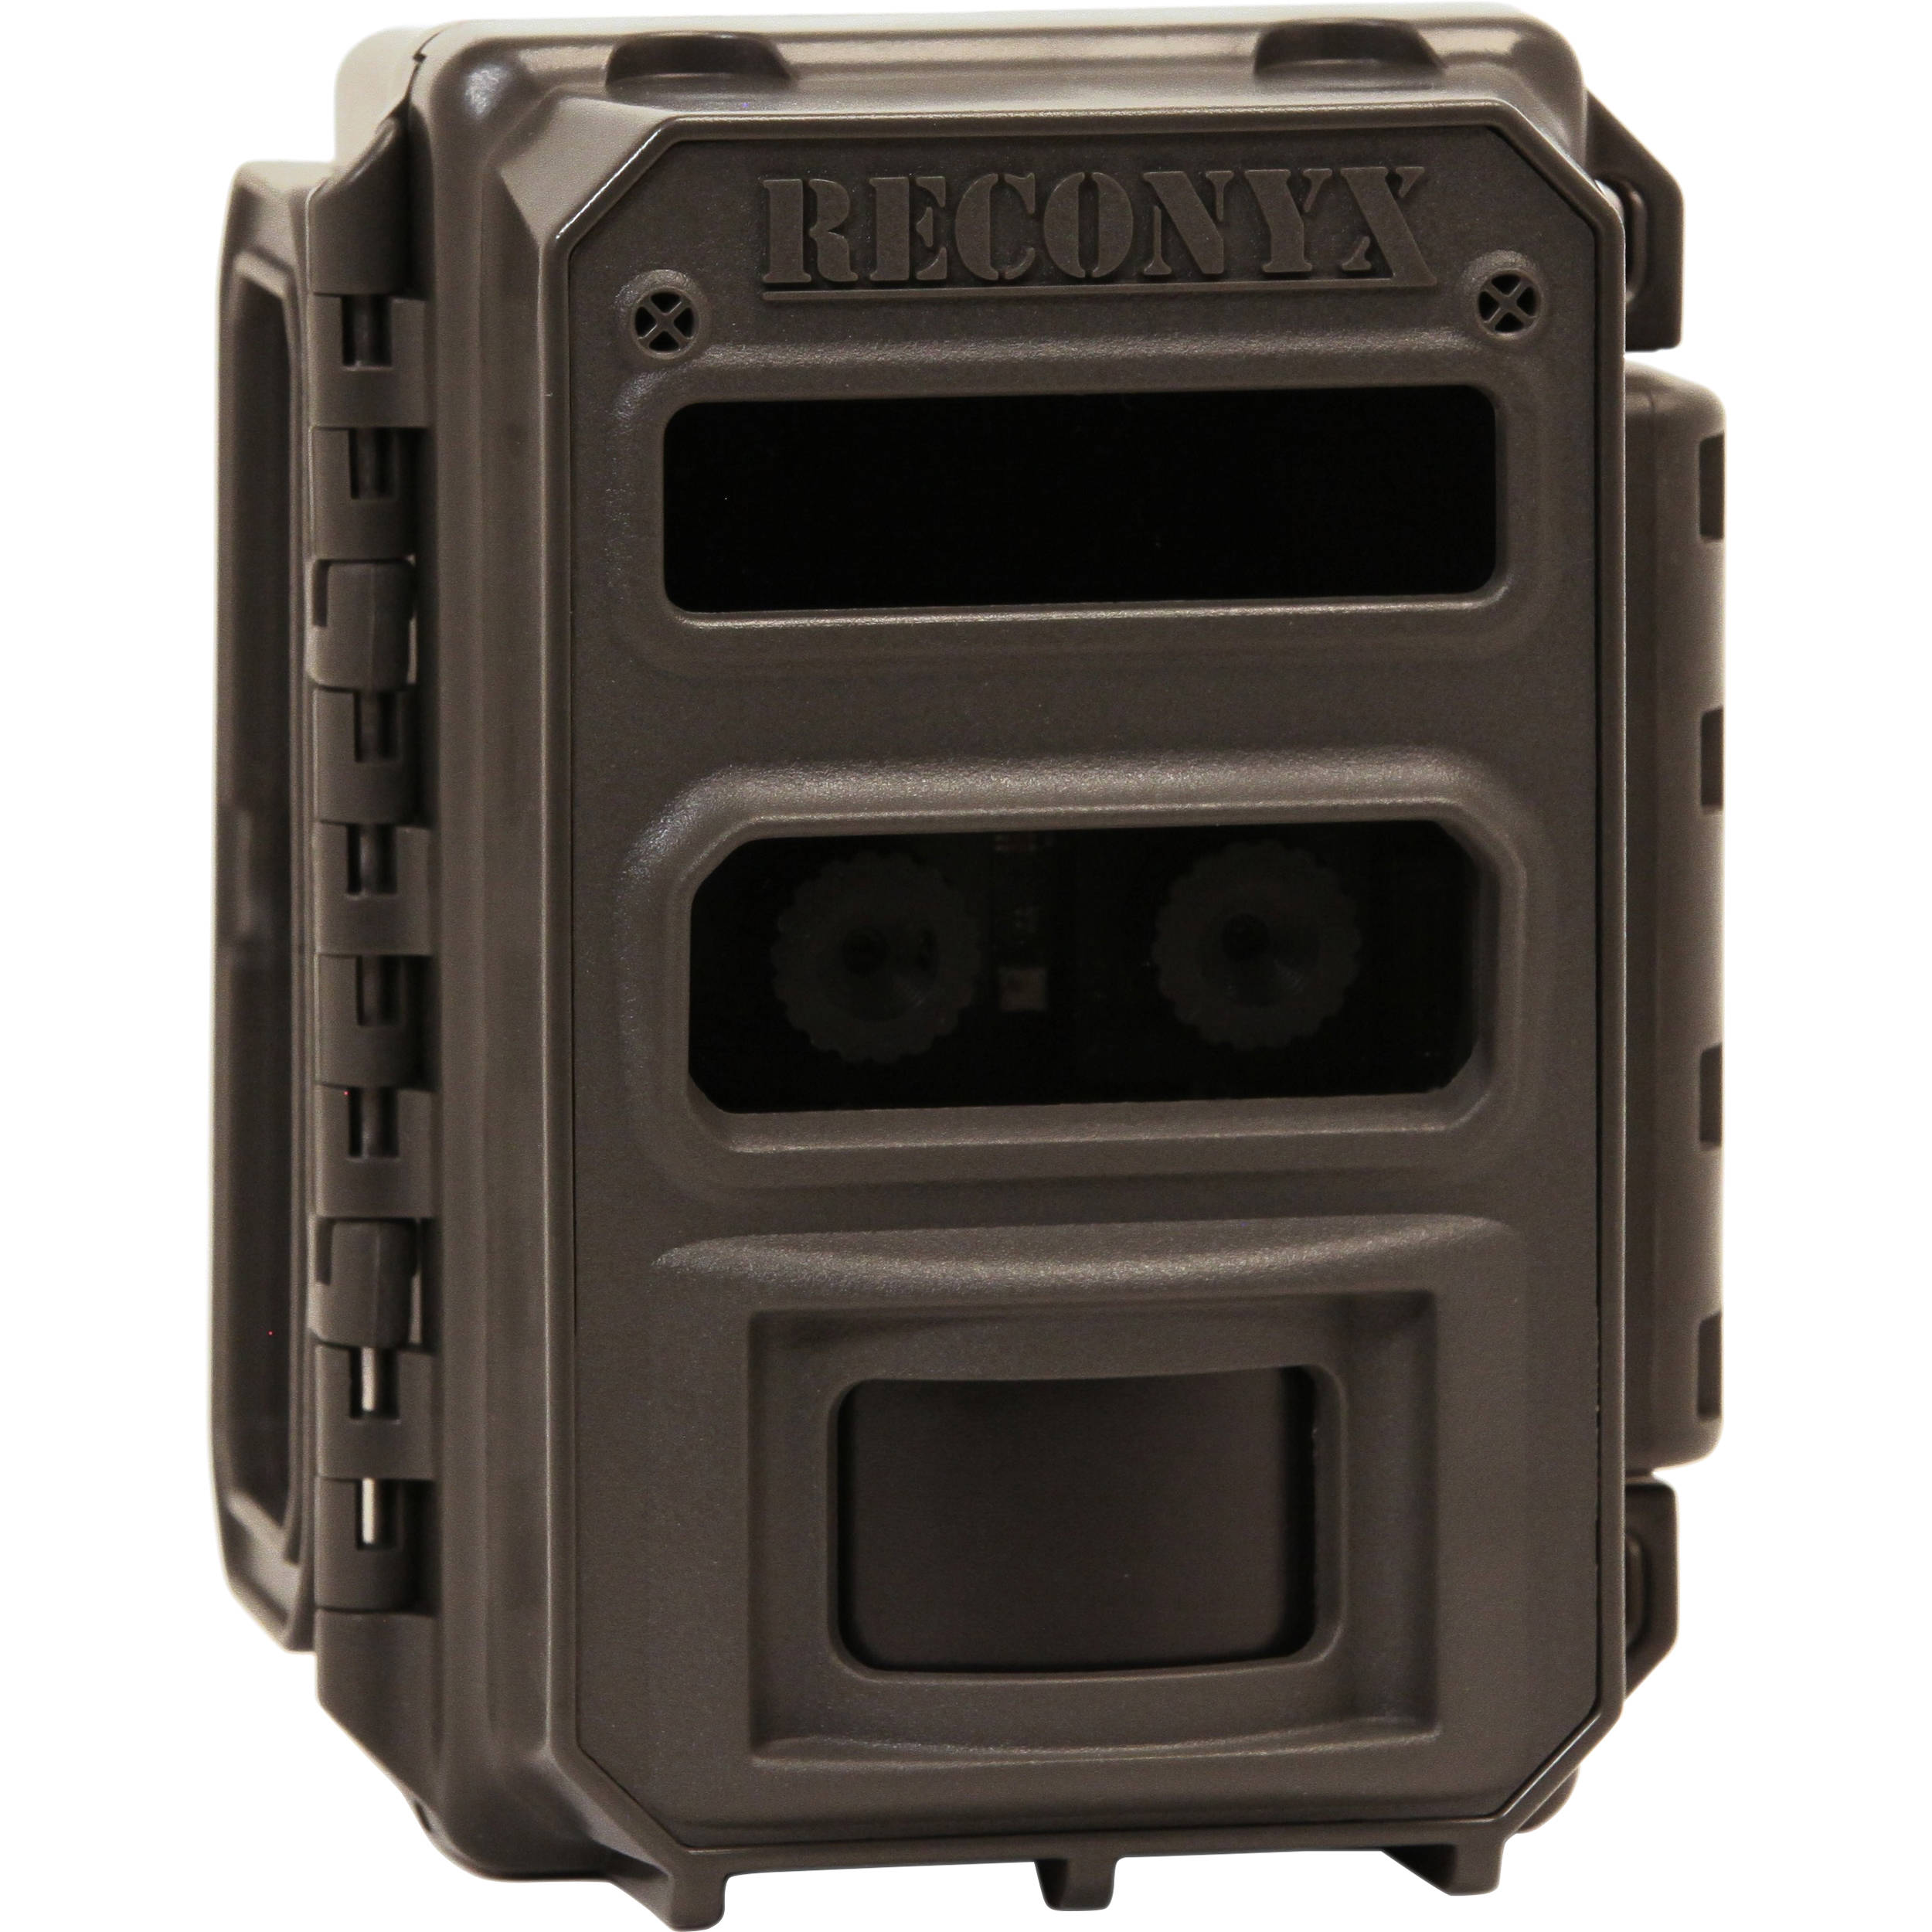 RECONYX XR6 UltraFire High Output Covert IR Trail Camera XR6 B&H